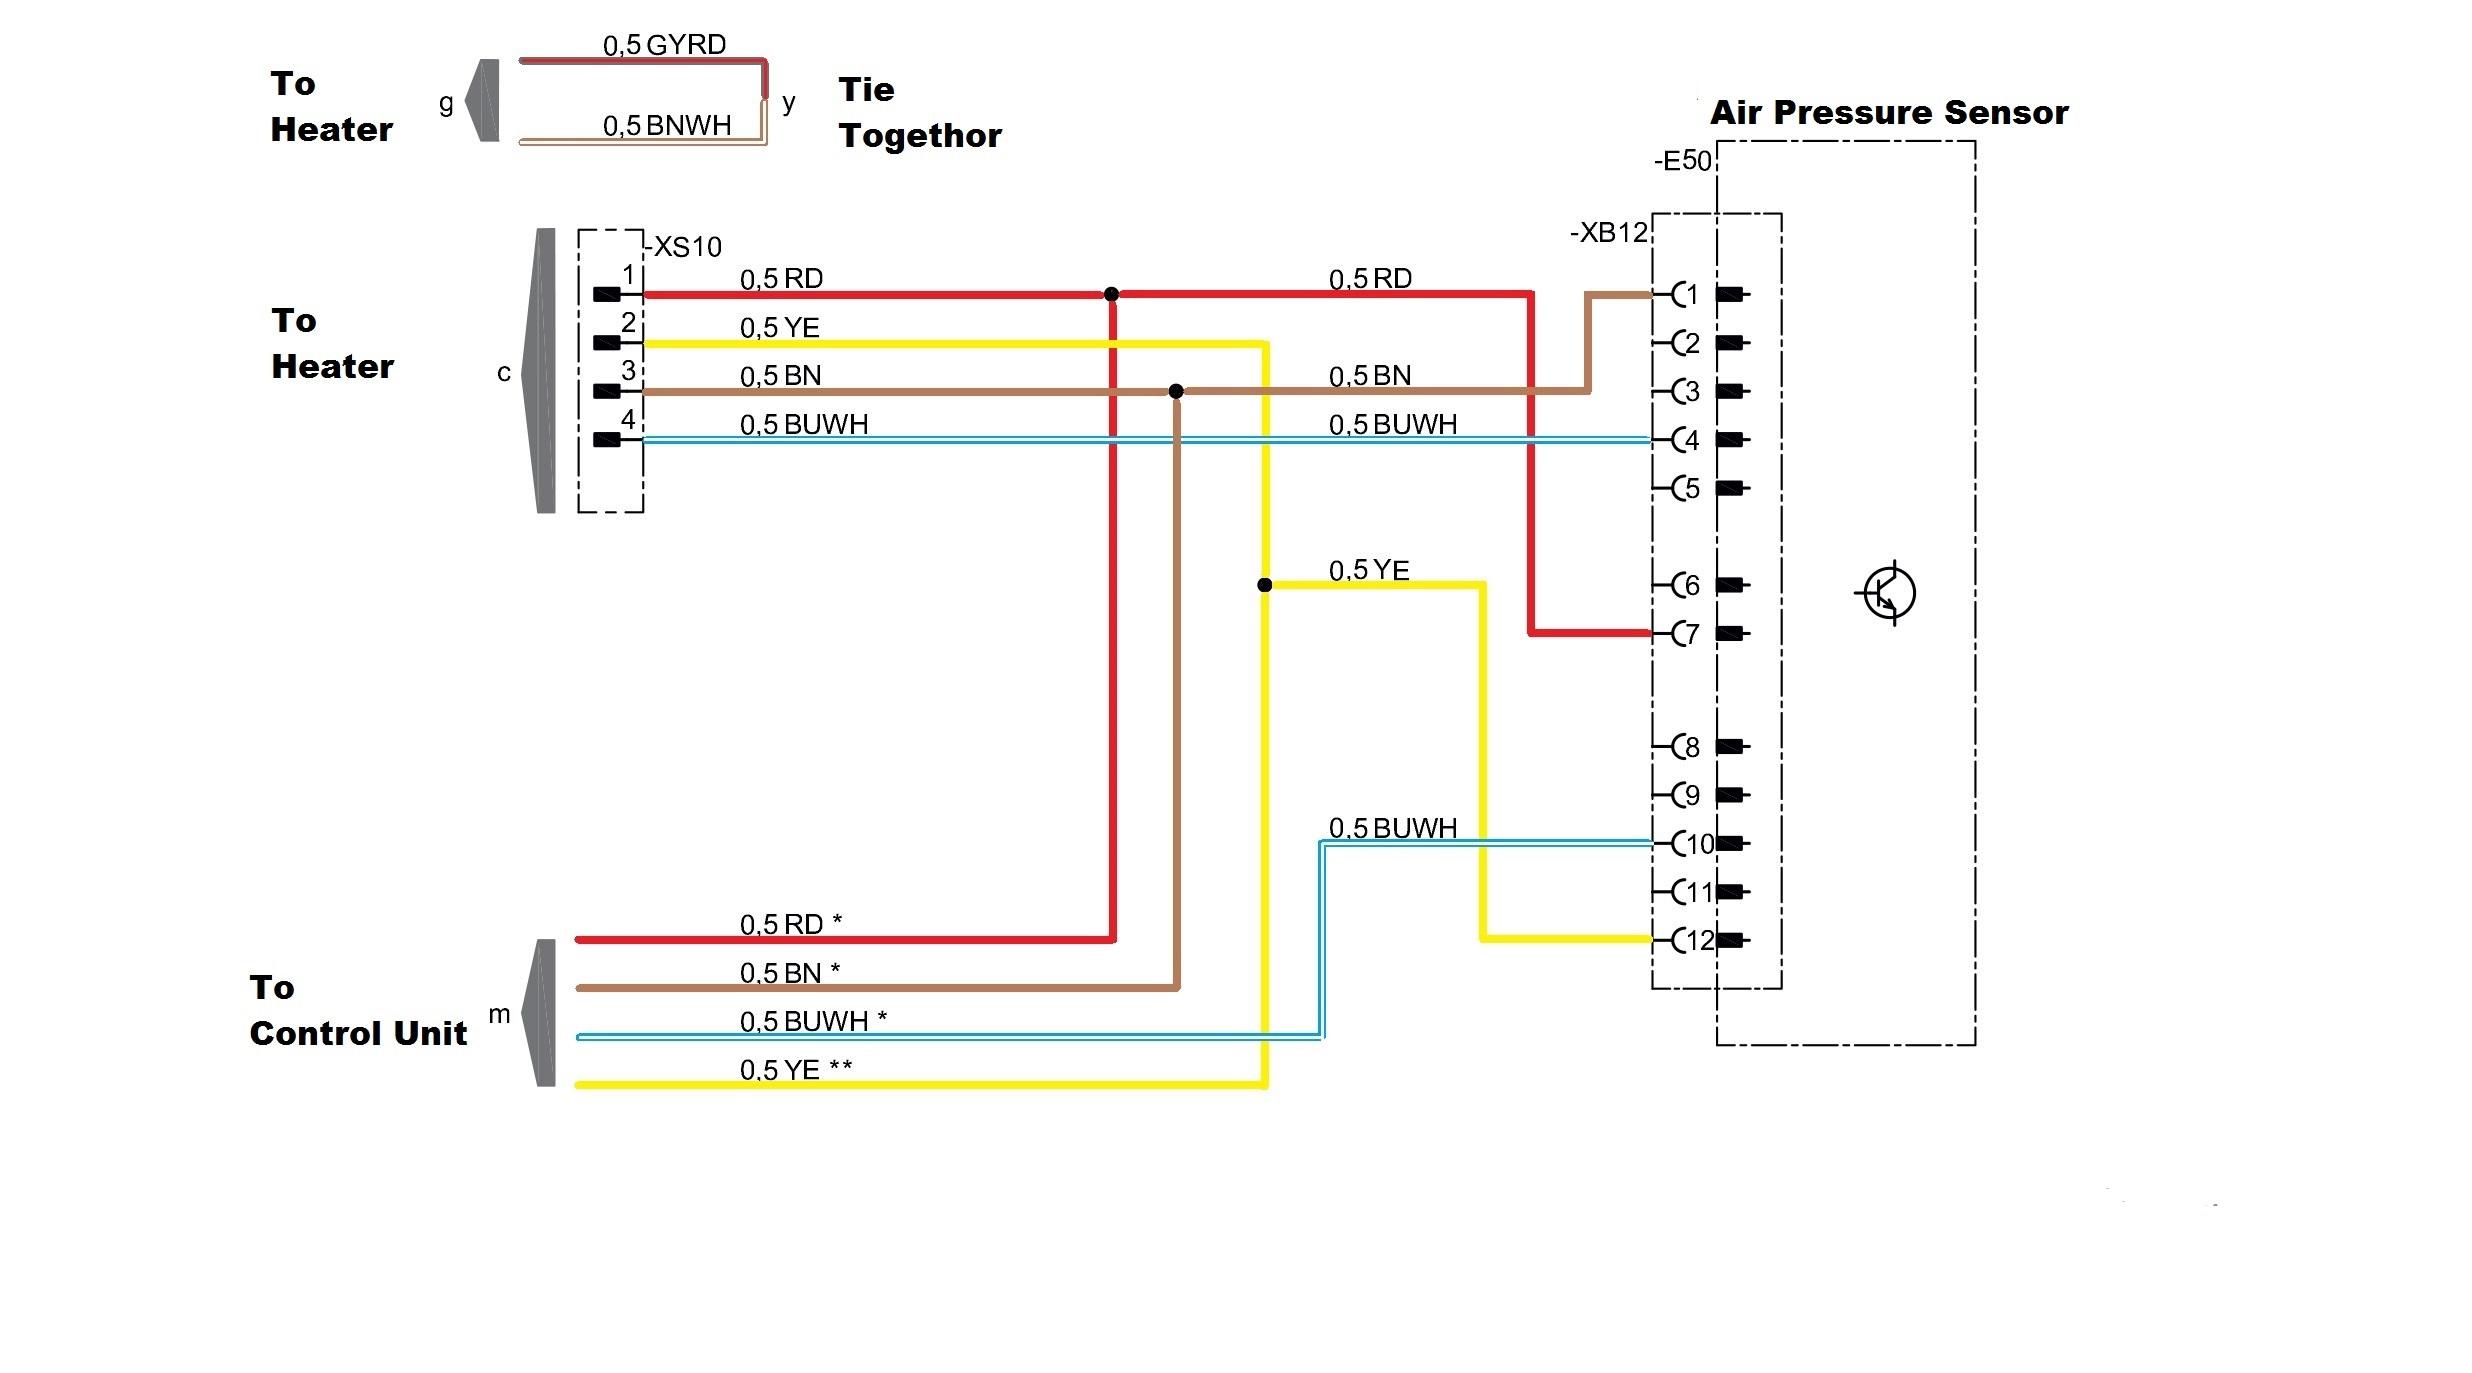 typical hoa wiring diagram voltage sensing relay 20 schwabenschamanen de espar d2 heater library rh 54 hermandadredencion eu allen bradley